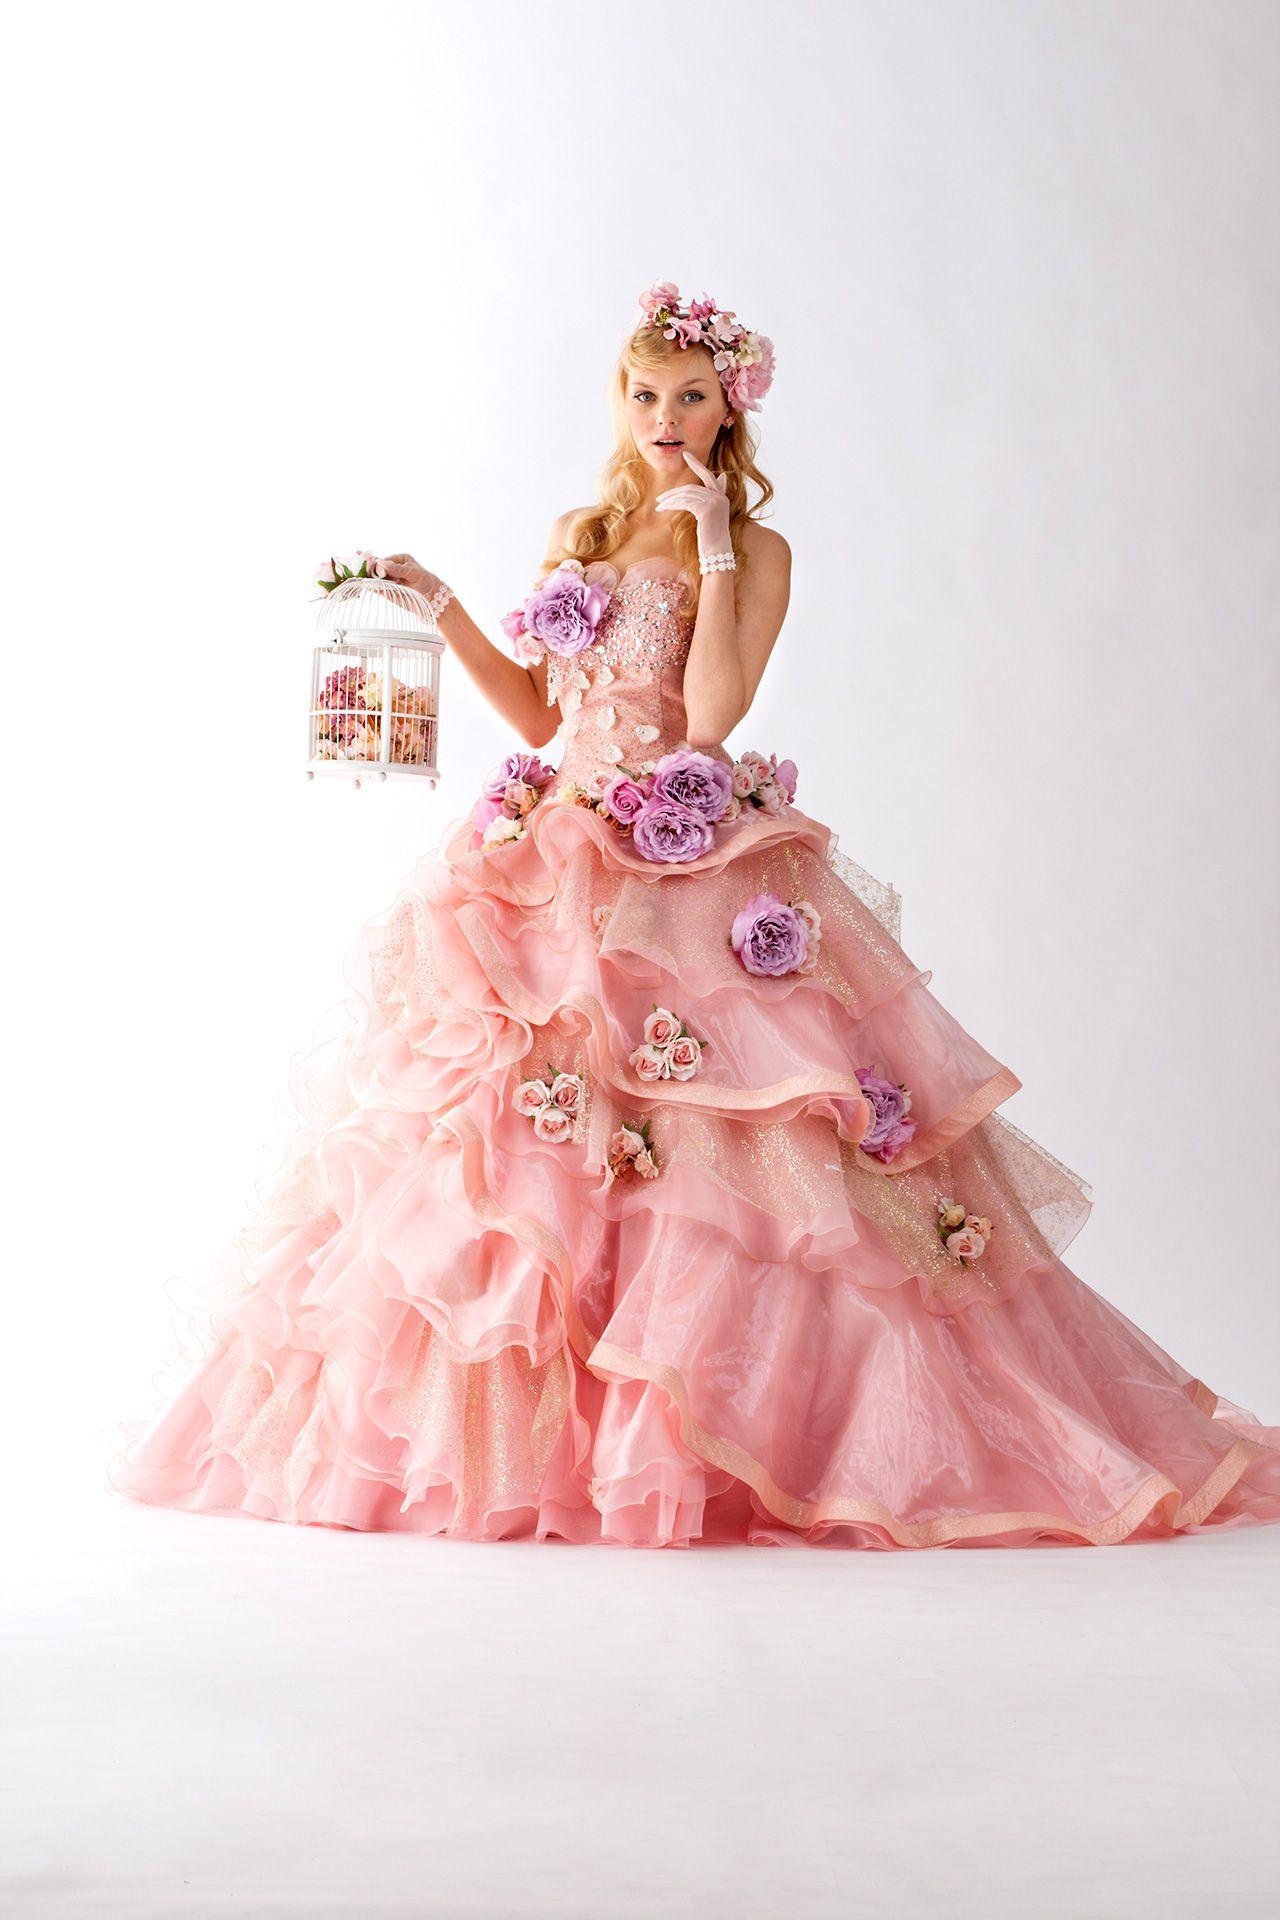 Flower Dress | Woman and Flowers | Pinterest | Accesorios de época ...